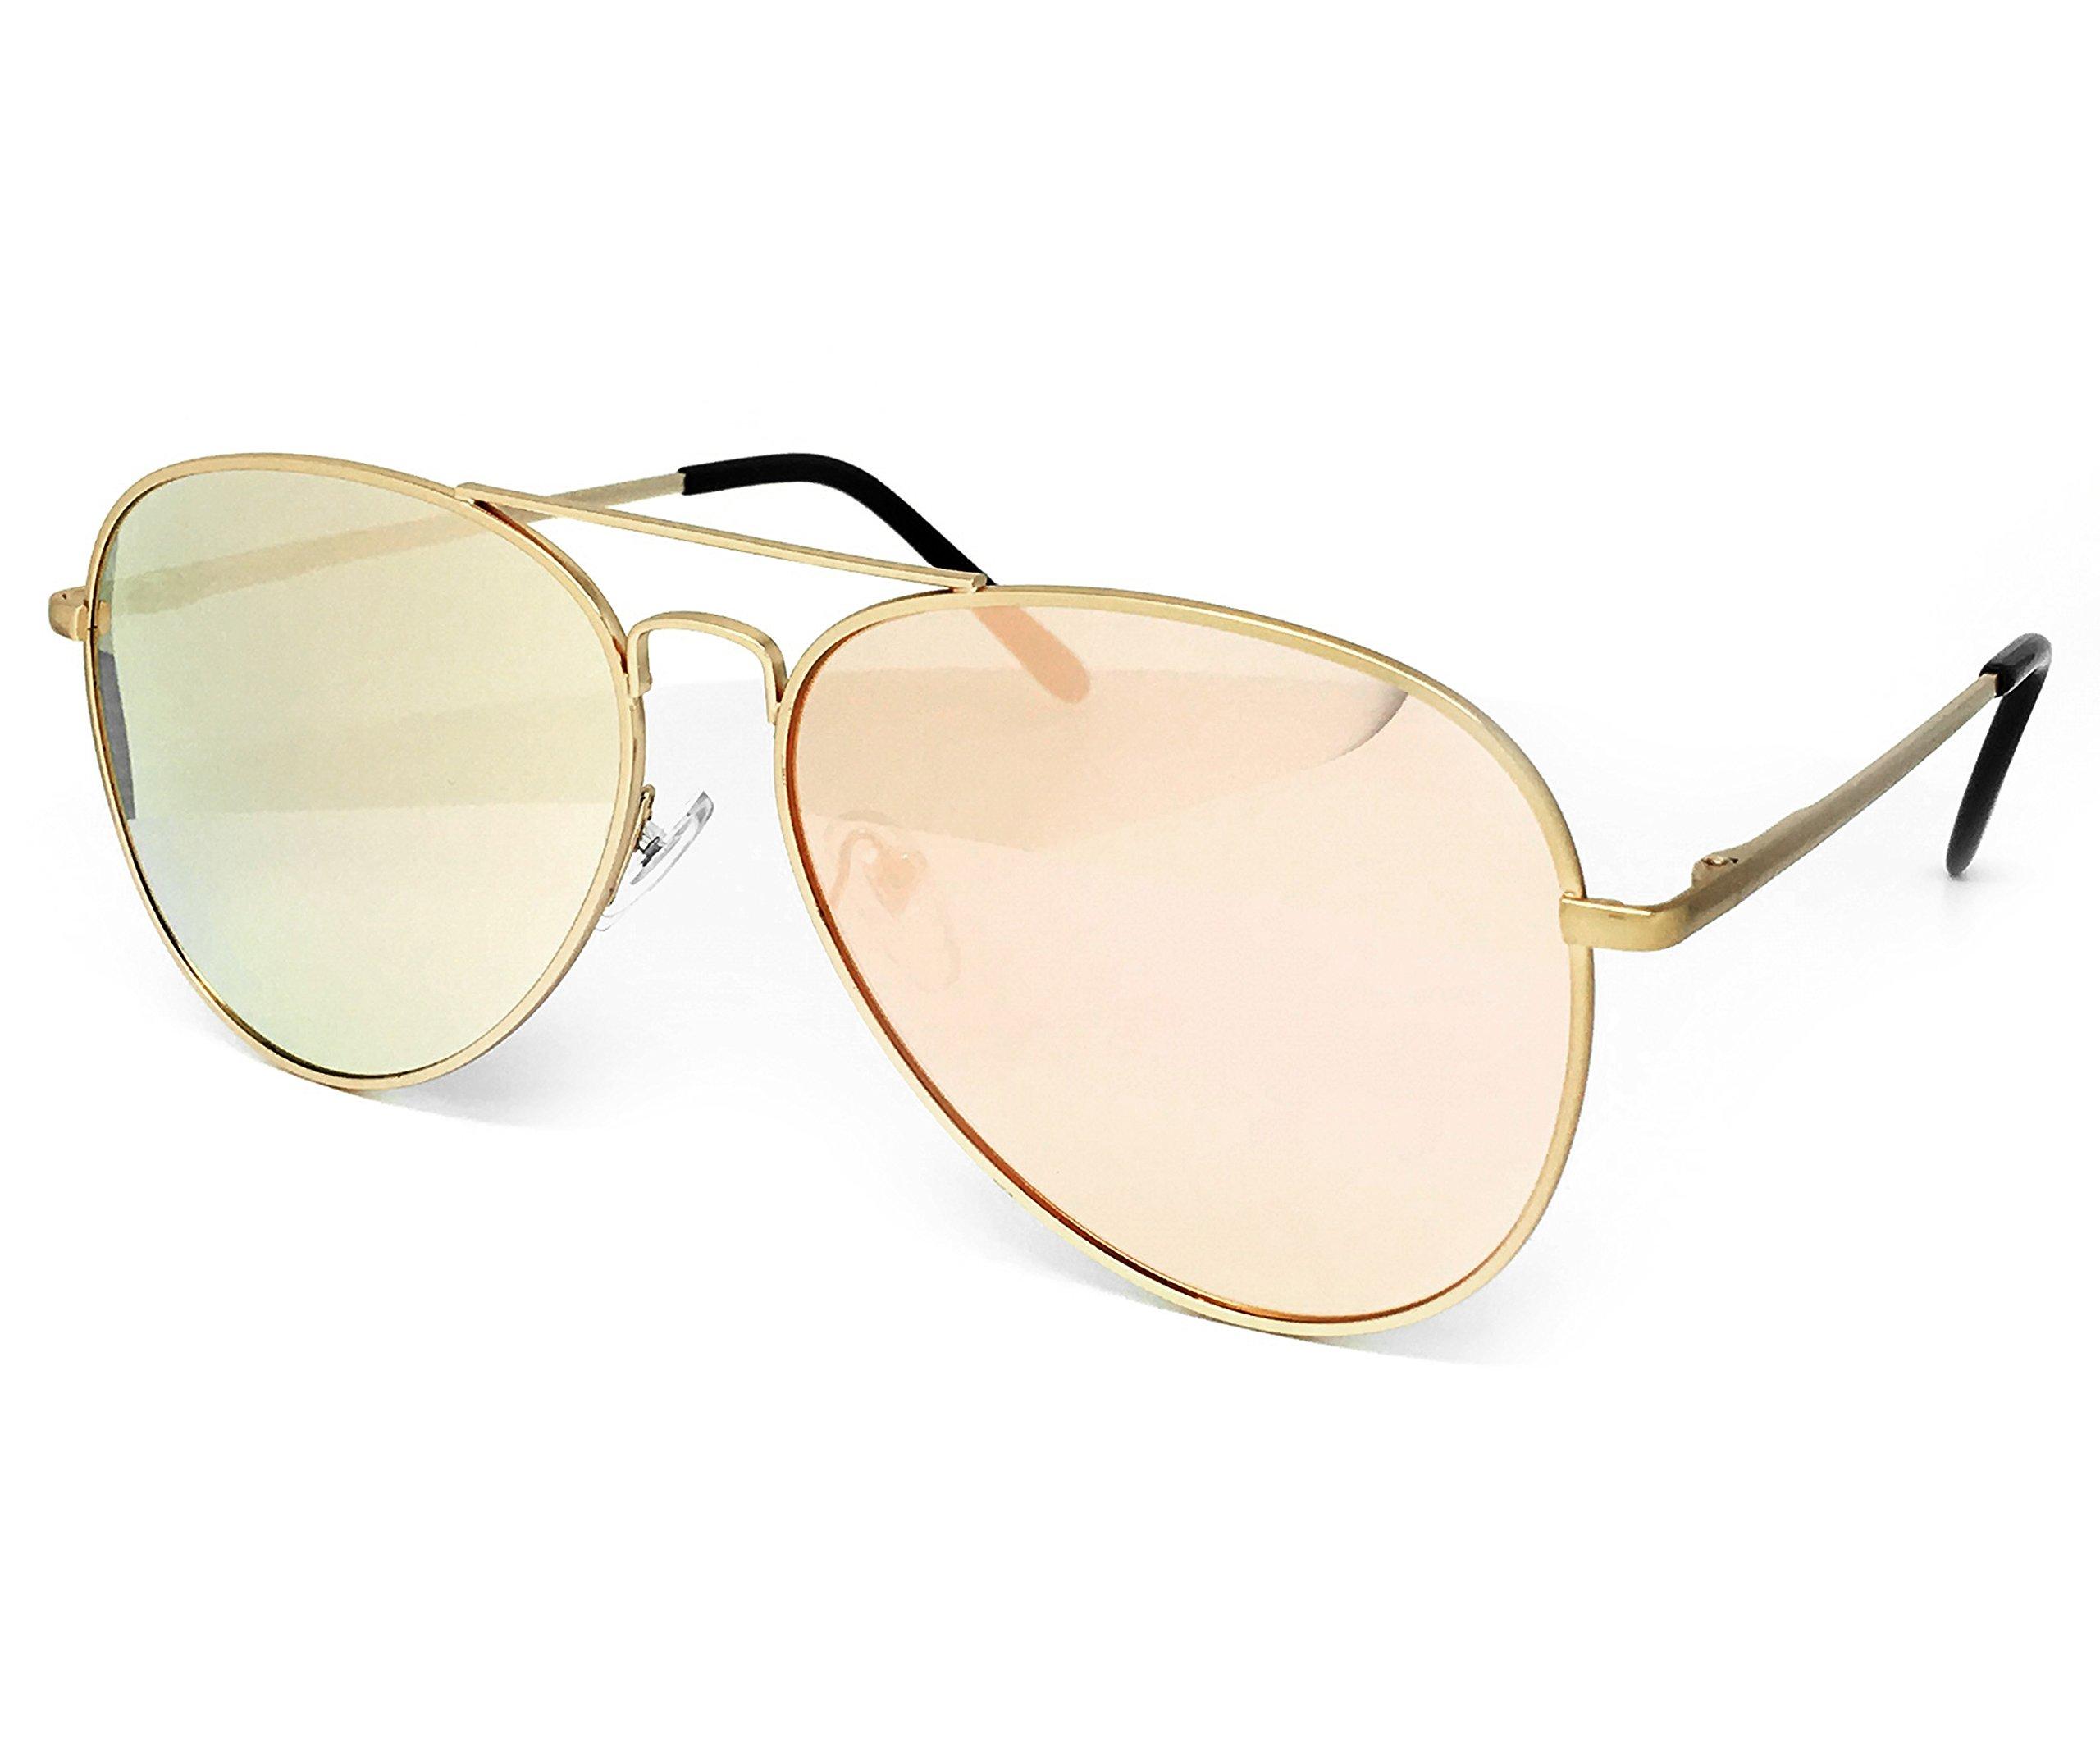 fe2132fe04 O2 Eyewear 97025 Premium Oversized Flat Aviator Mirrored Sunglass Womens  Mens